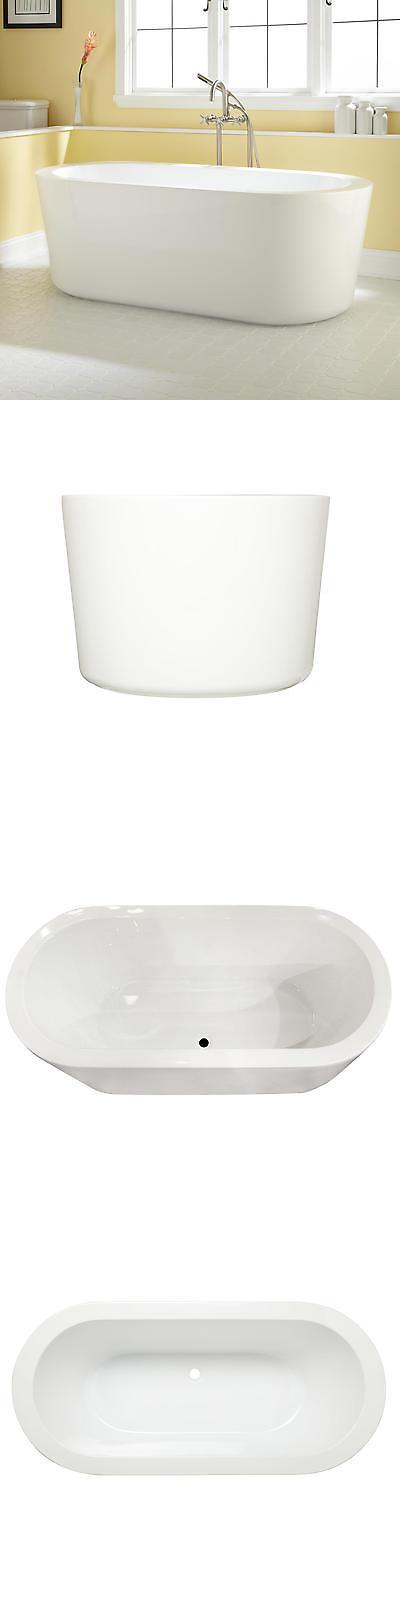 Bathtubs 42025: Signature Hardware Marlon Acrylic Freestanding Tub ...